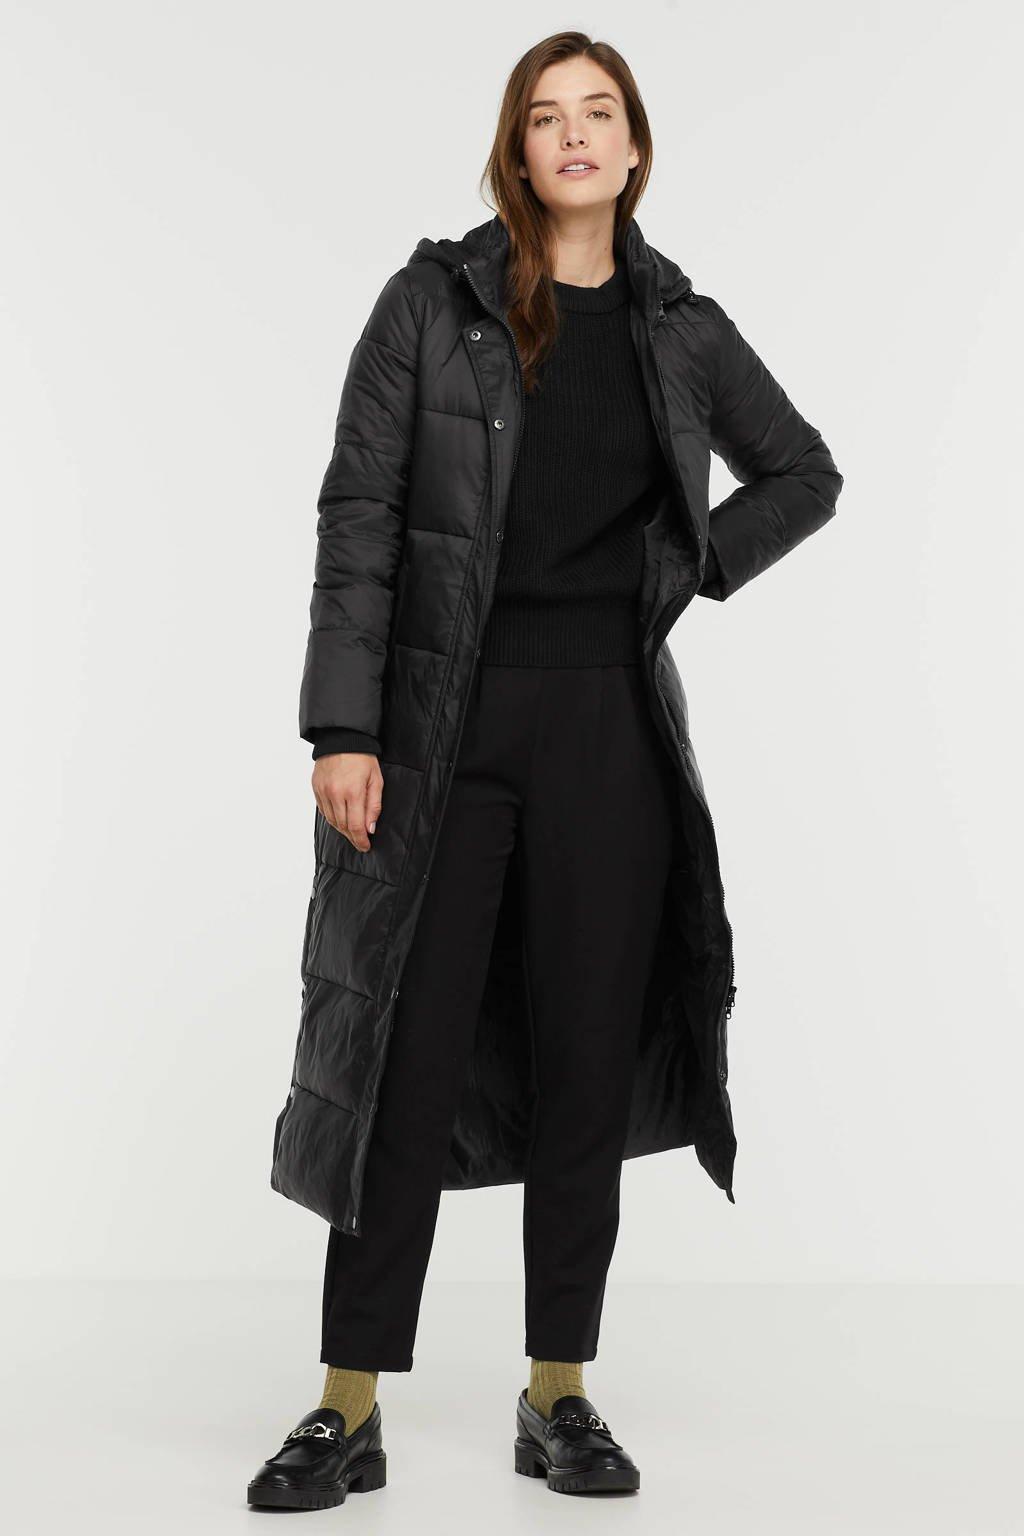 SisterS Point gewatteerde jas DUSTY-JA zwart, Zwart